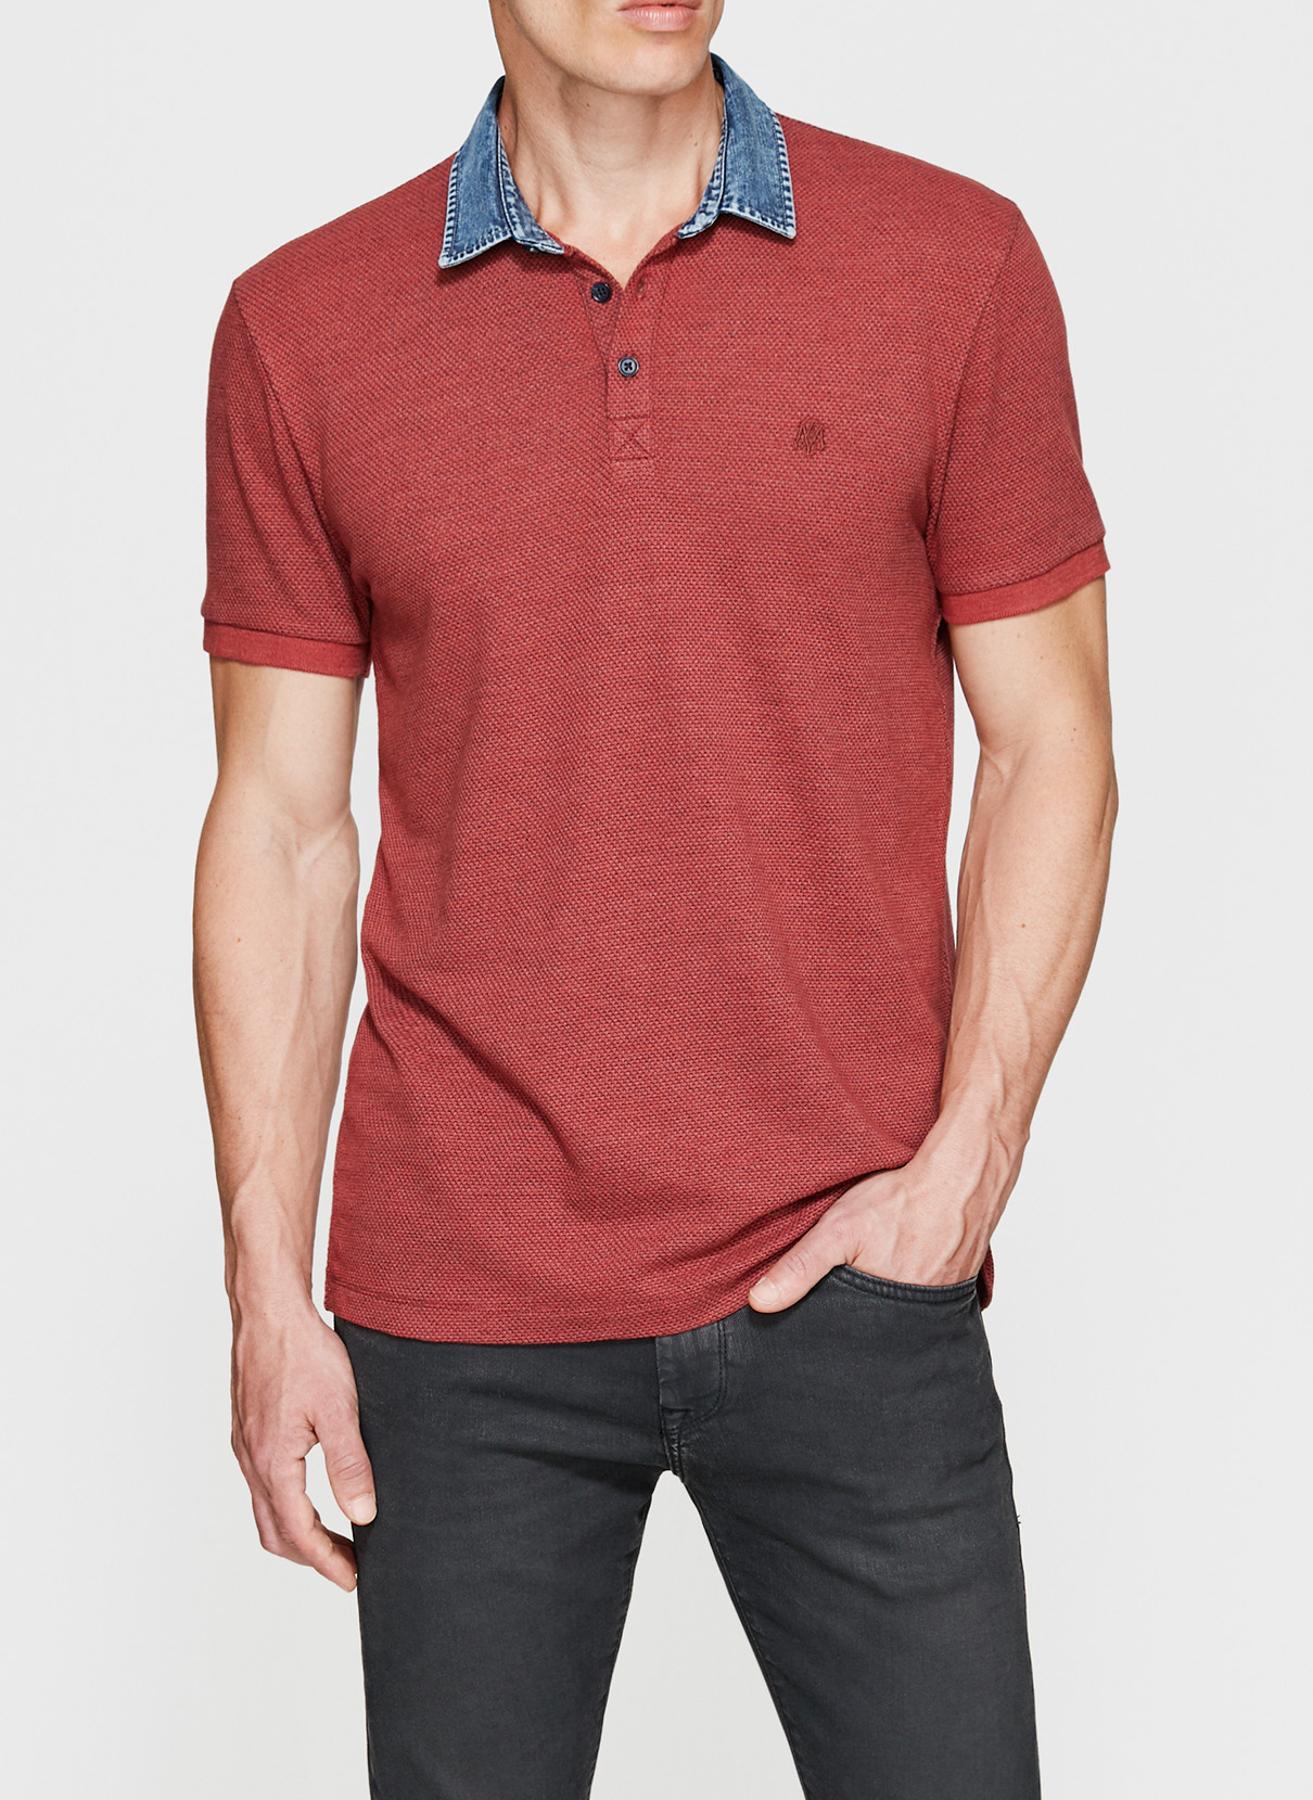 Mavi T-Shirt L 5001946390001 Ürün Resmi